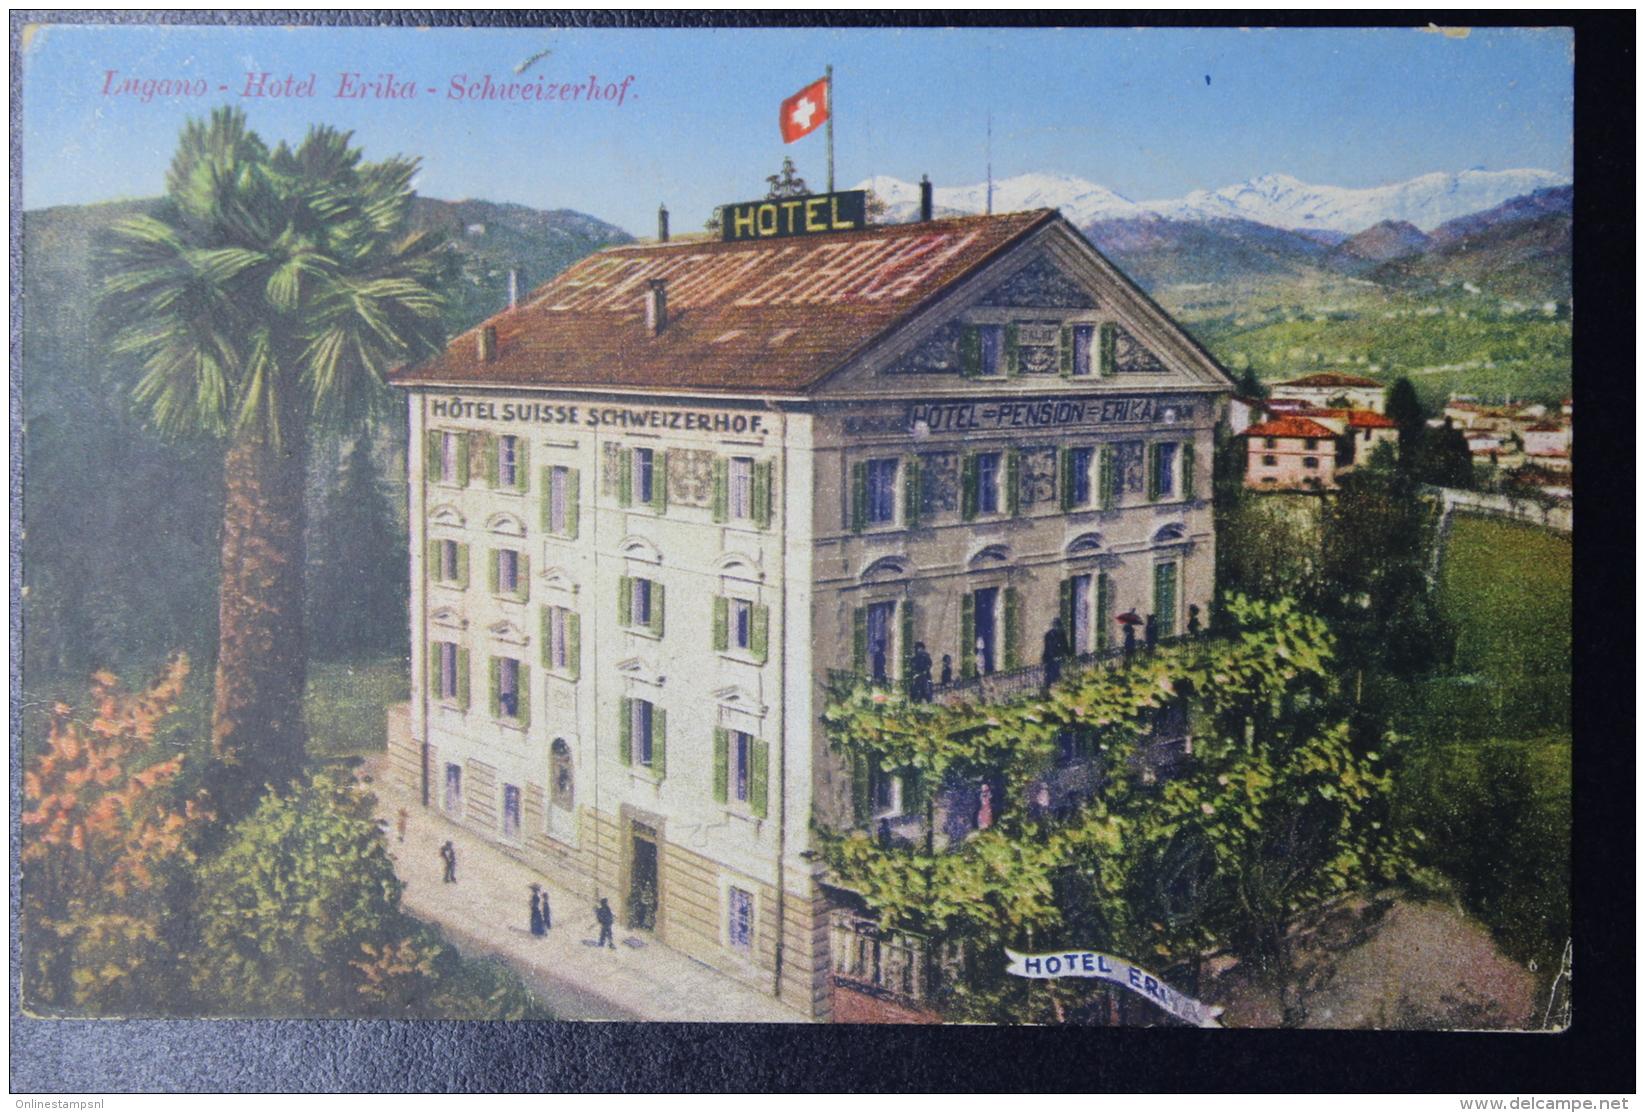 Lugano Hotel Erika Schweizerhof2